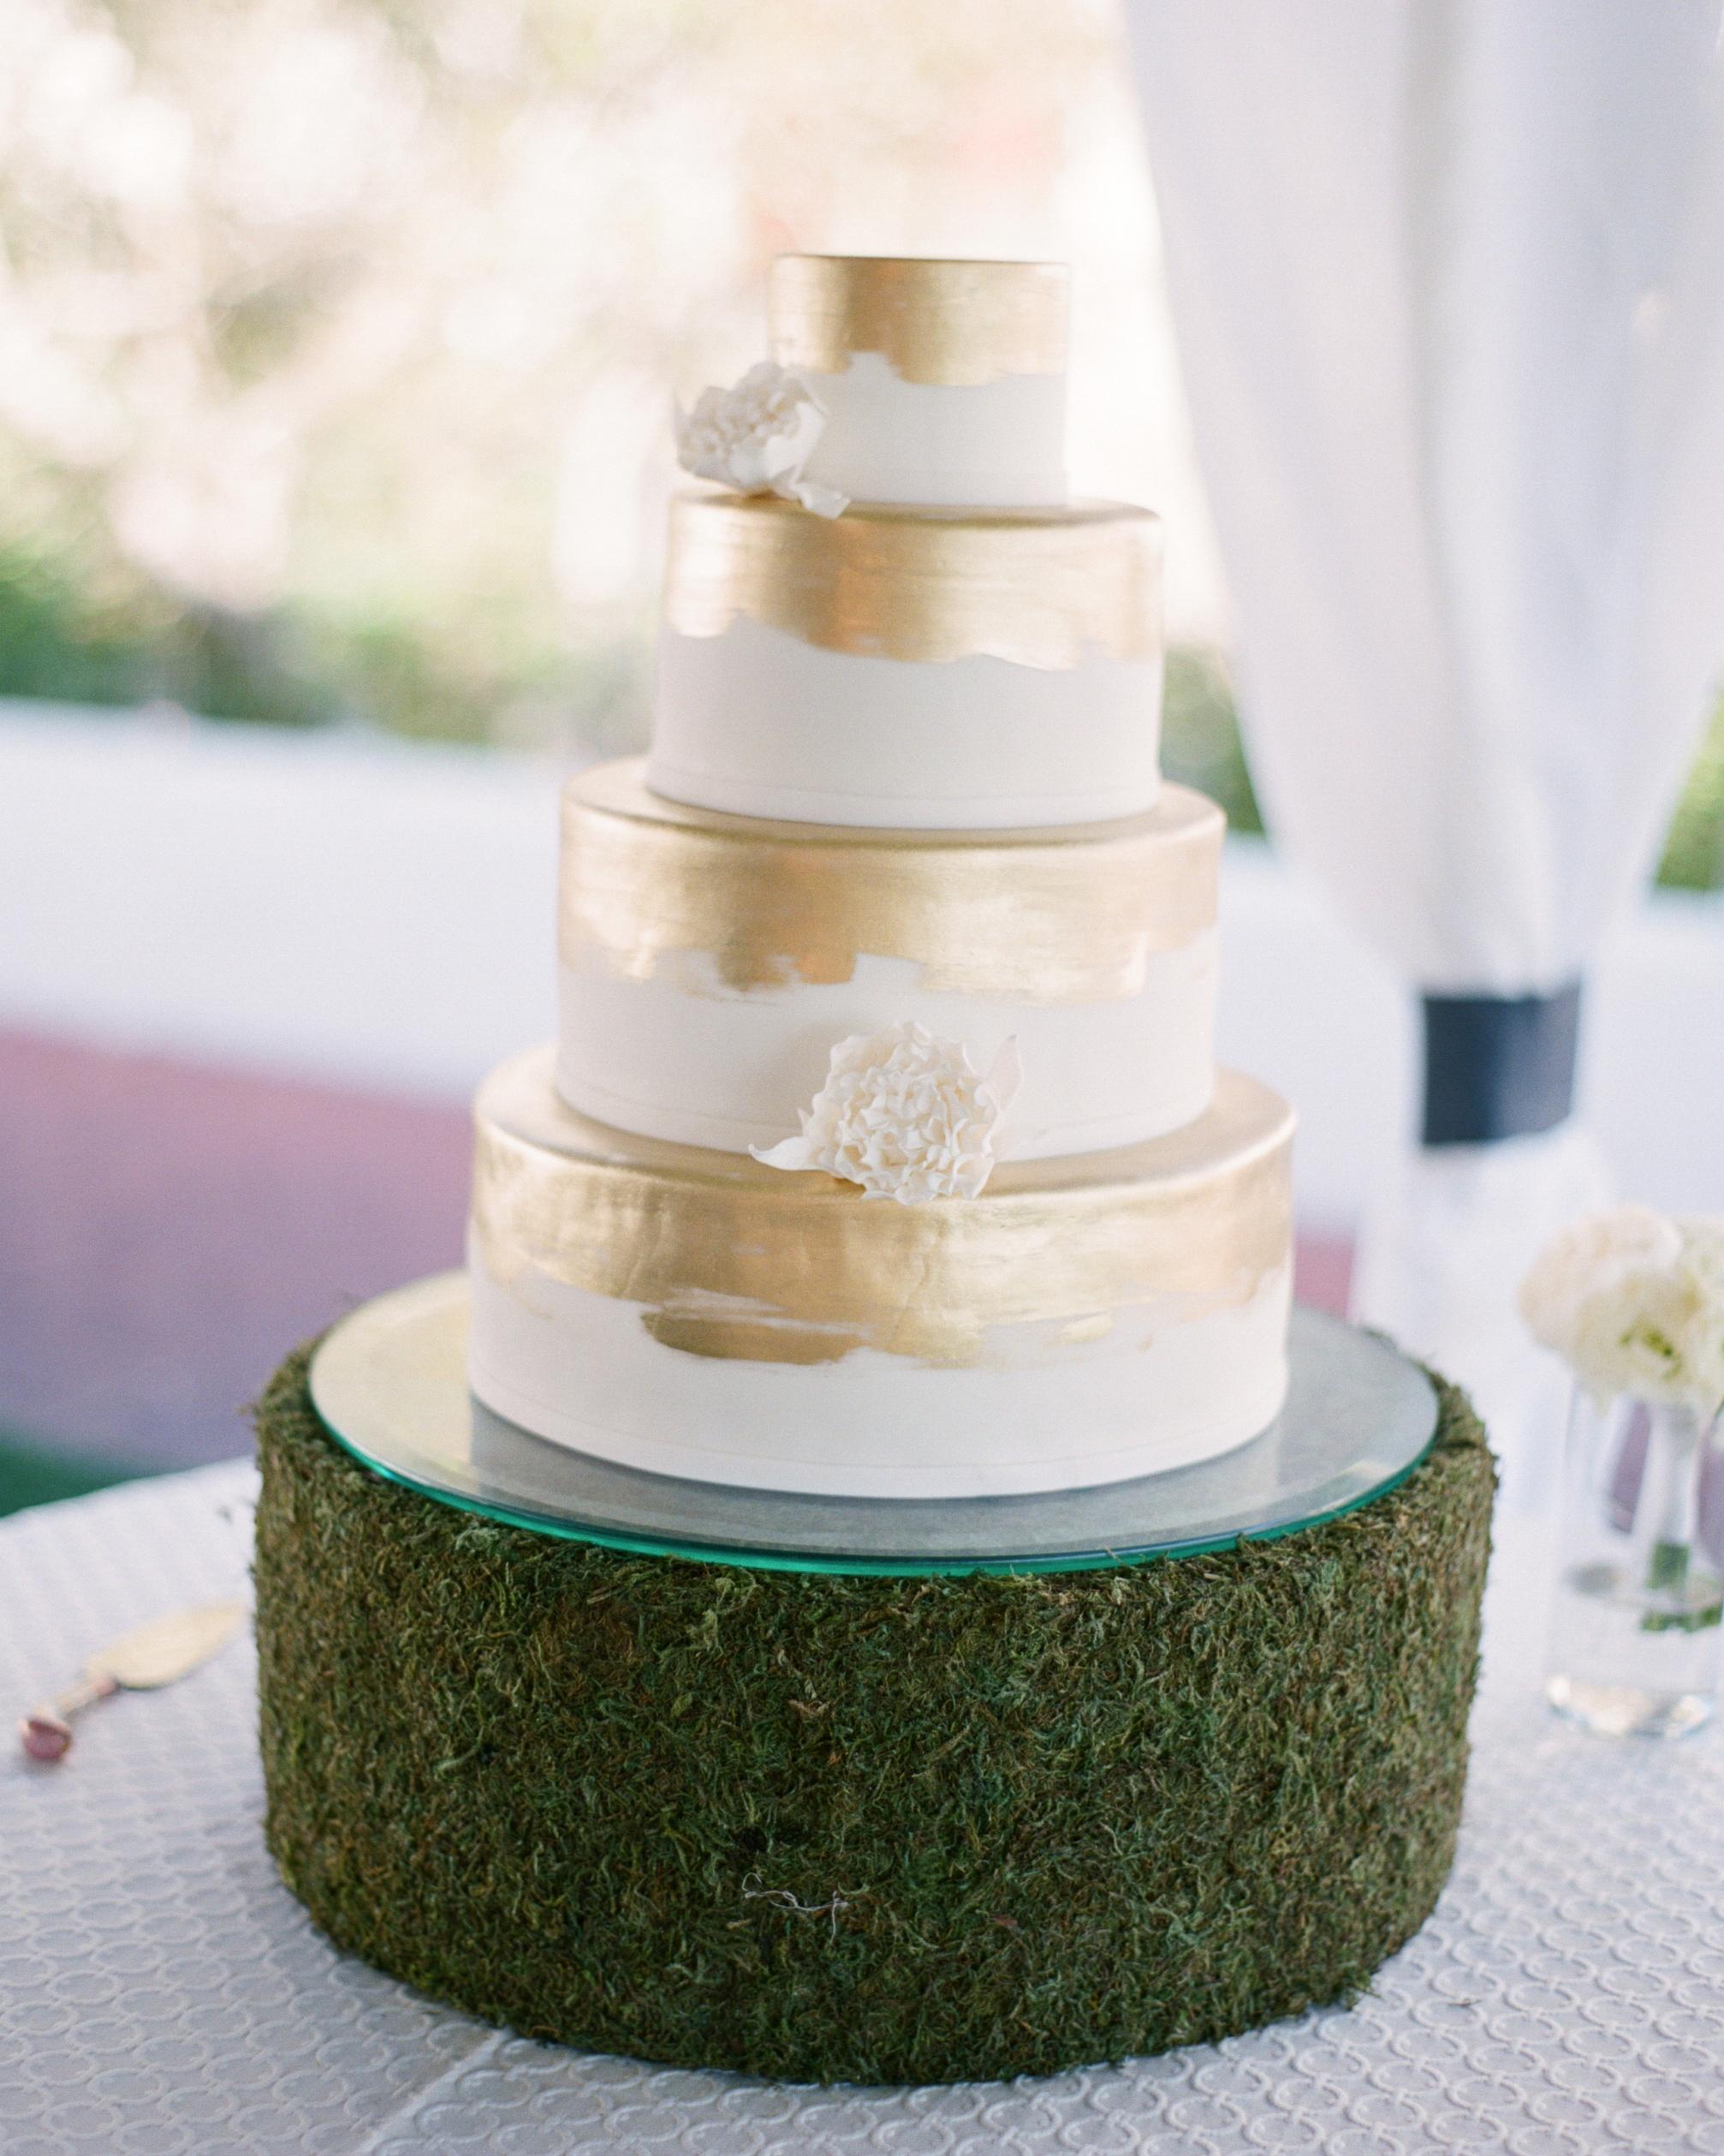 jennifer-adrien-wedding-cake-0614.jpg